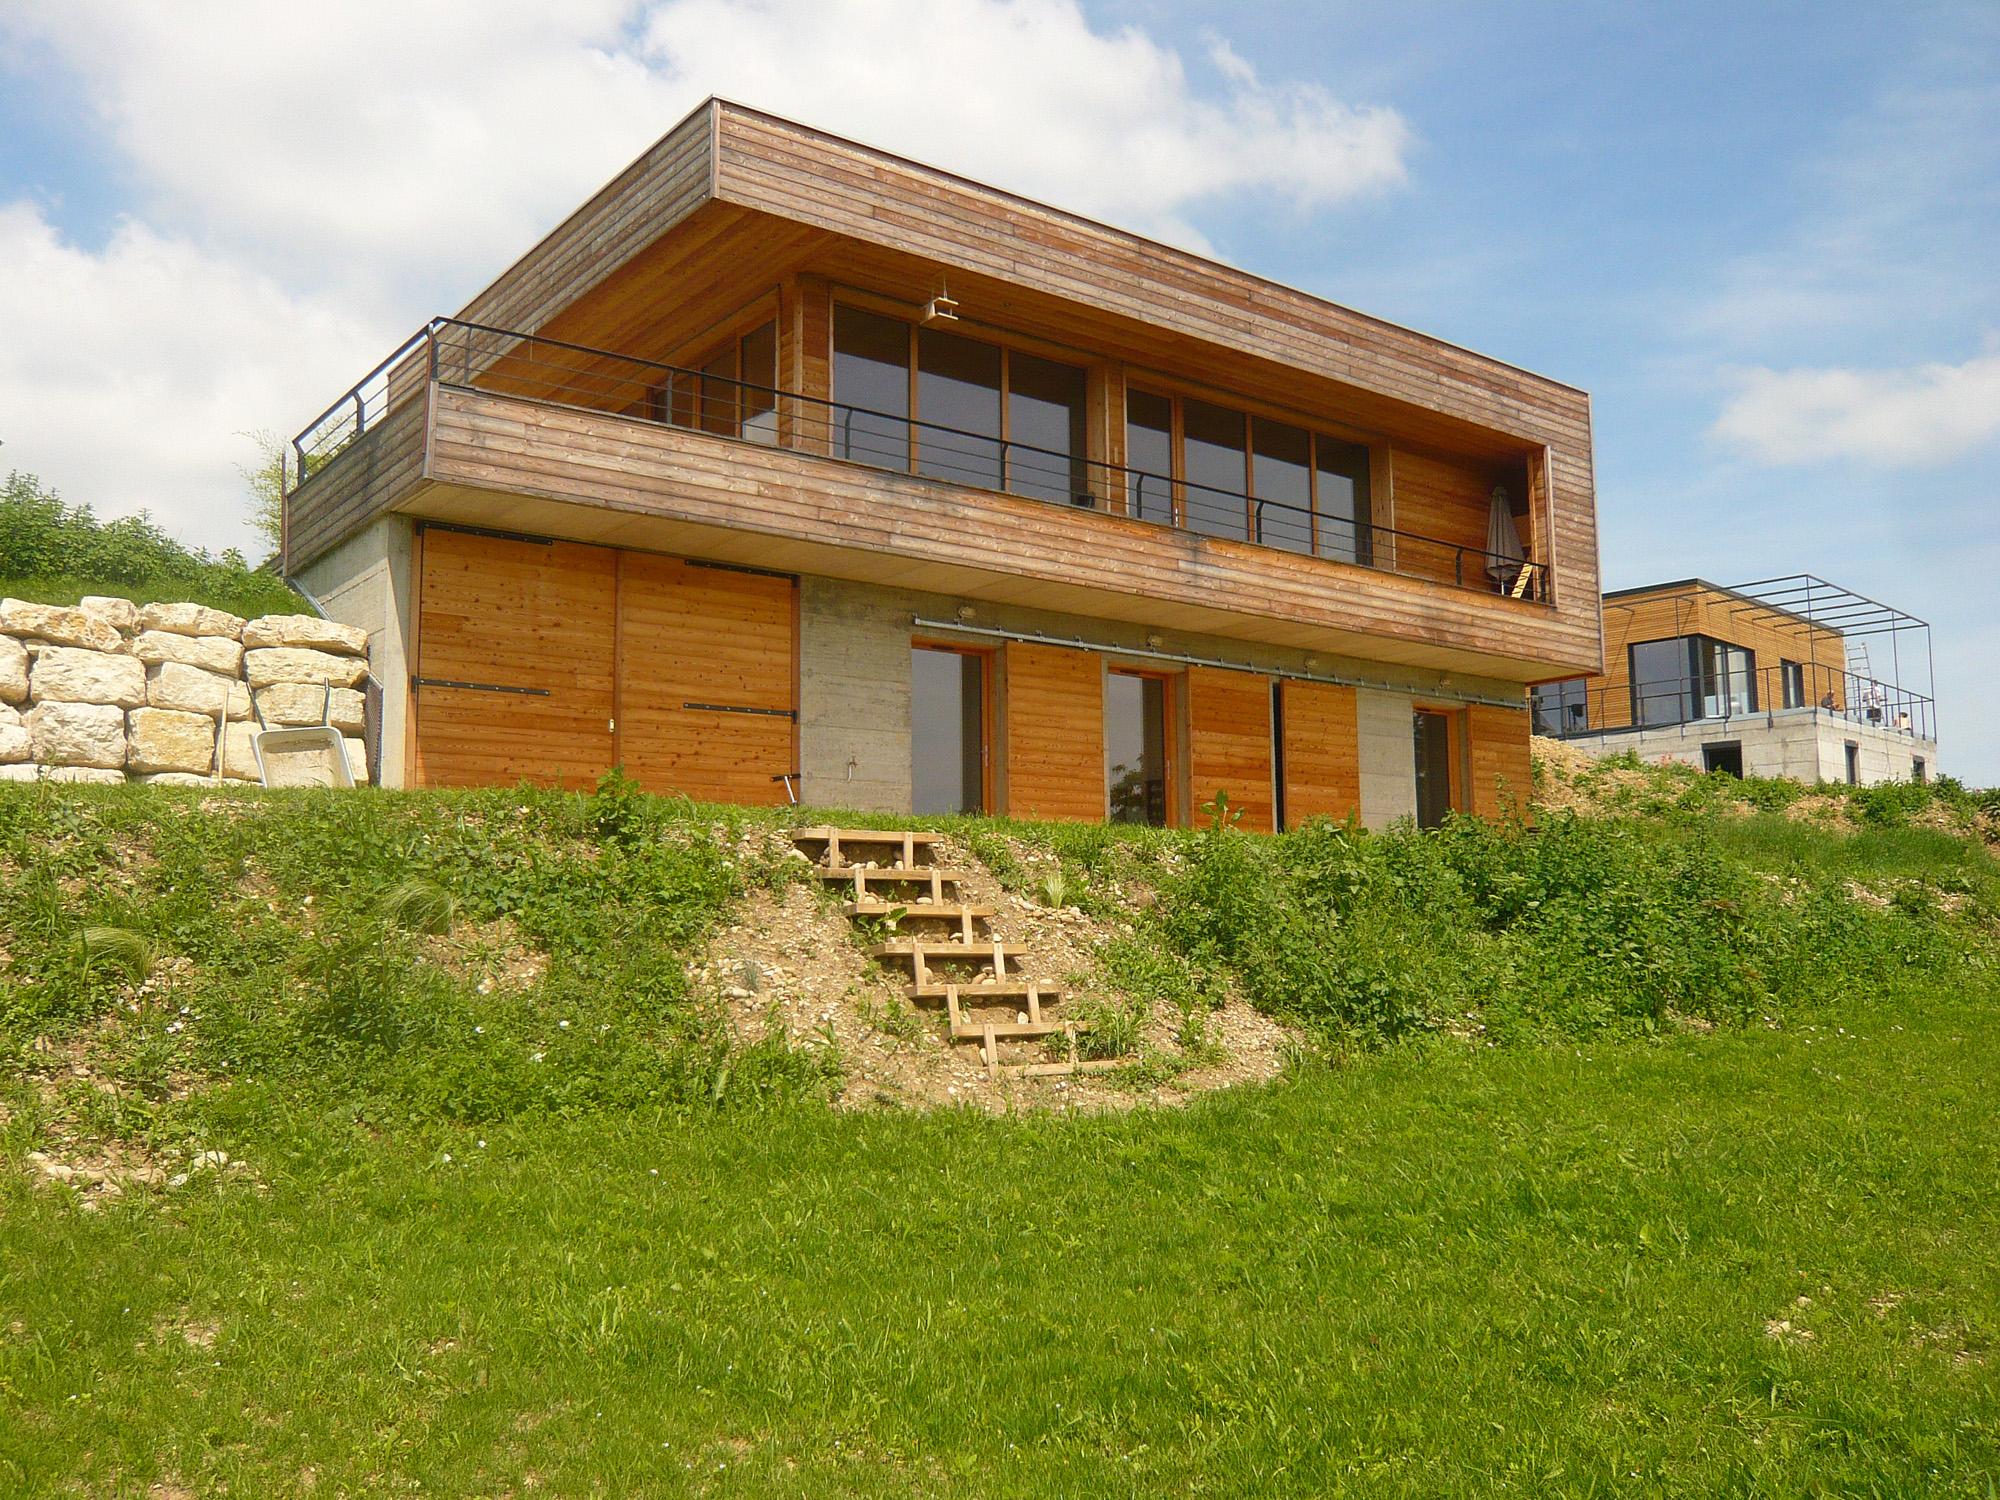 Terrasse jardin immobilier lyon mulhouse maison design for Jardin terrasse immobilier